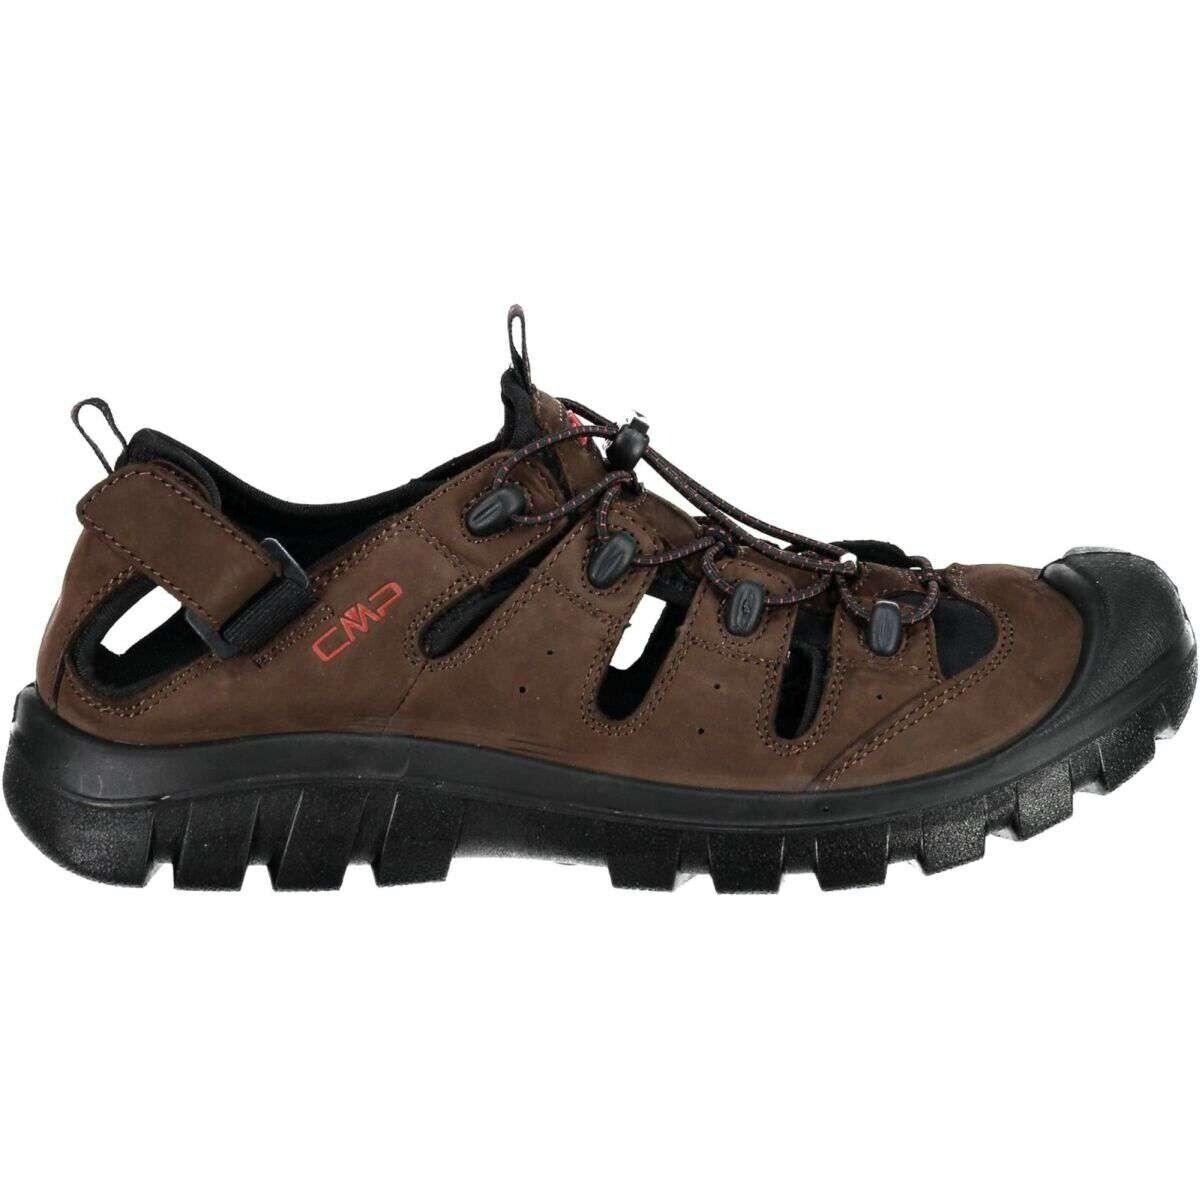 CMP Avior Hiking Sandalen braun